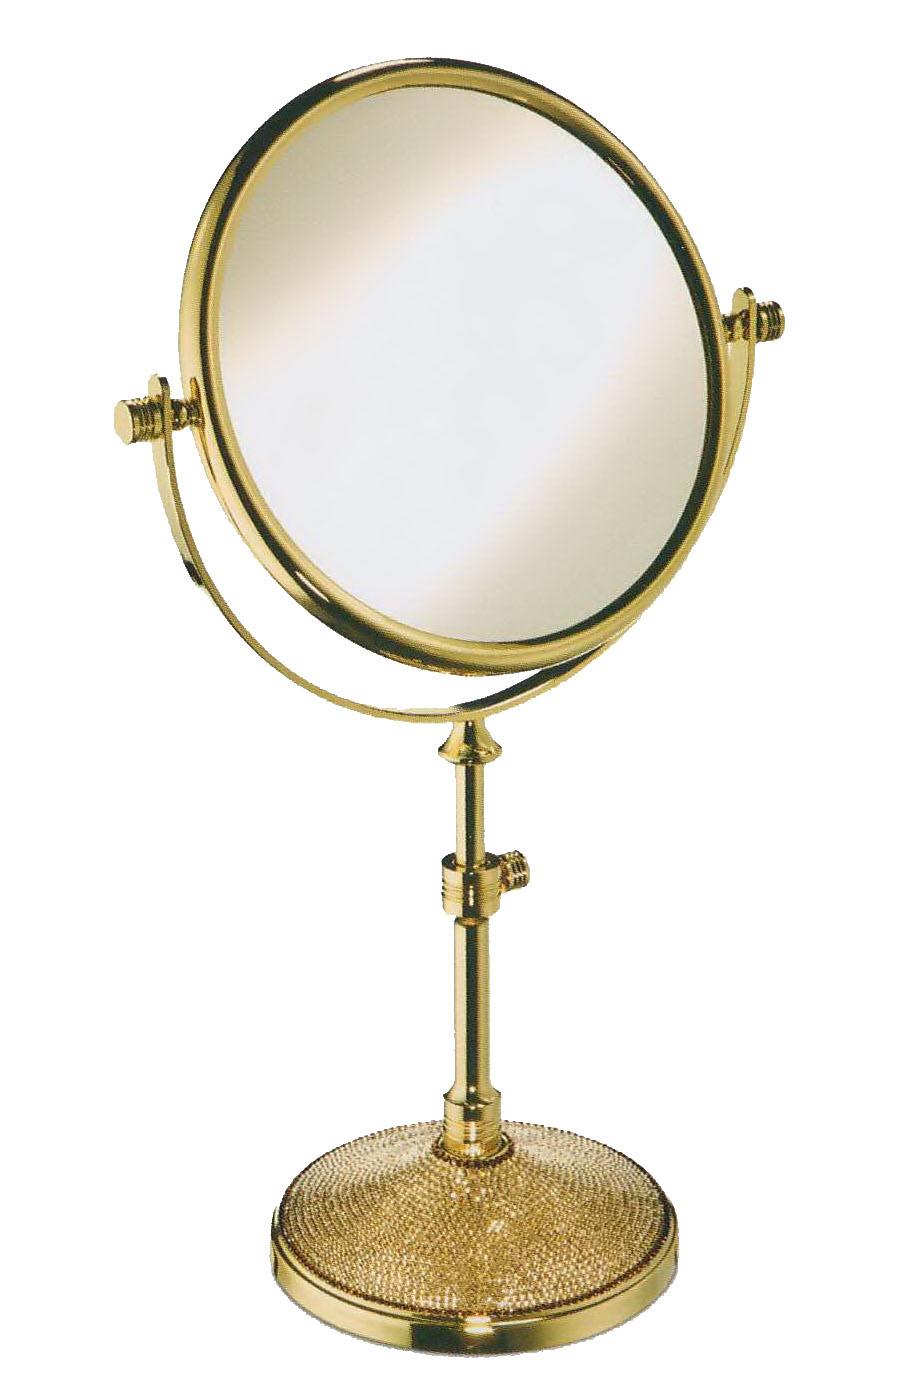 Зеркала Зеркало косметическое Windisch 99532O 3X Starlight elitnoe-zerkalo-kosmeticheskoe-99532o-3x-starlight-ot-windisch-ispaniya.jpg